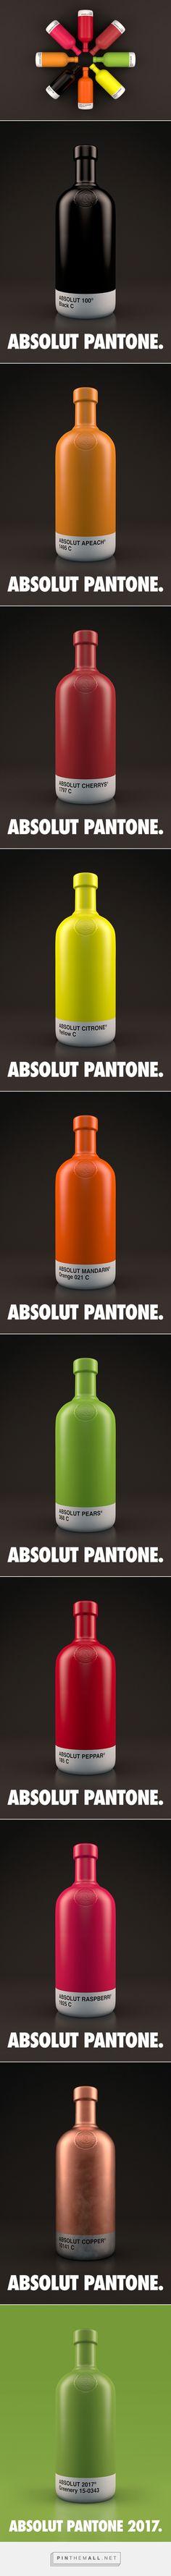 Absolut Pantone packaging design concept by Txaber - http://www.packagingoftheworld.com/2017/01/absolut-pantone.html